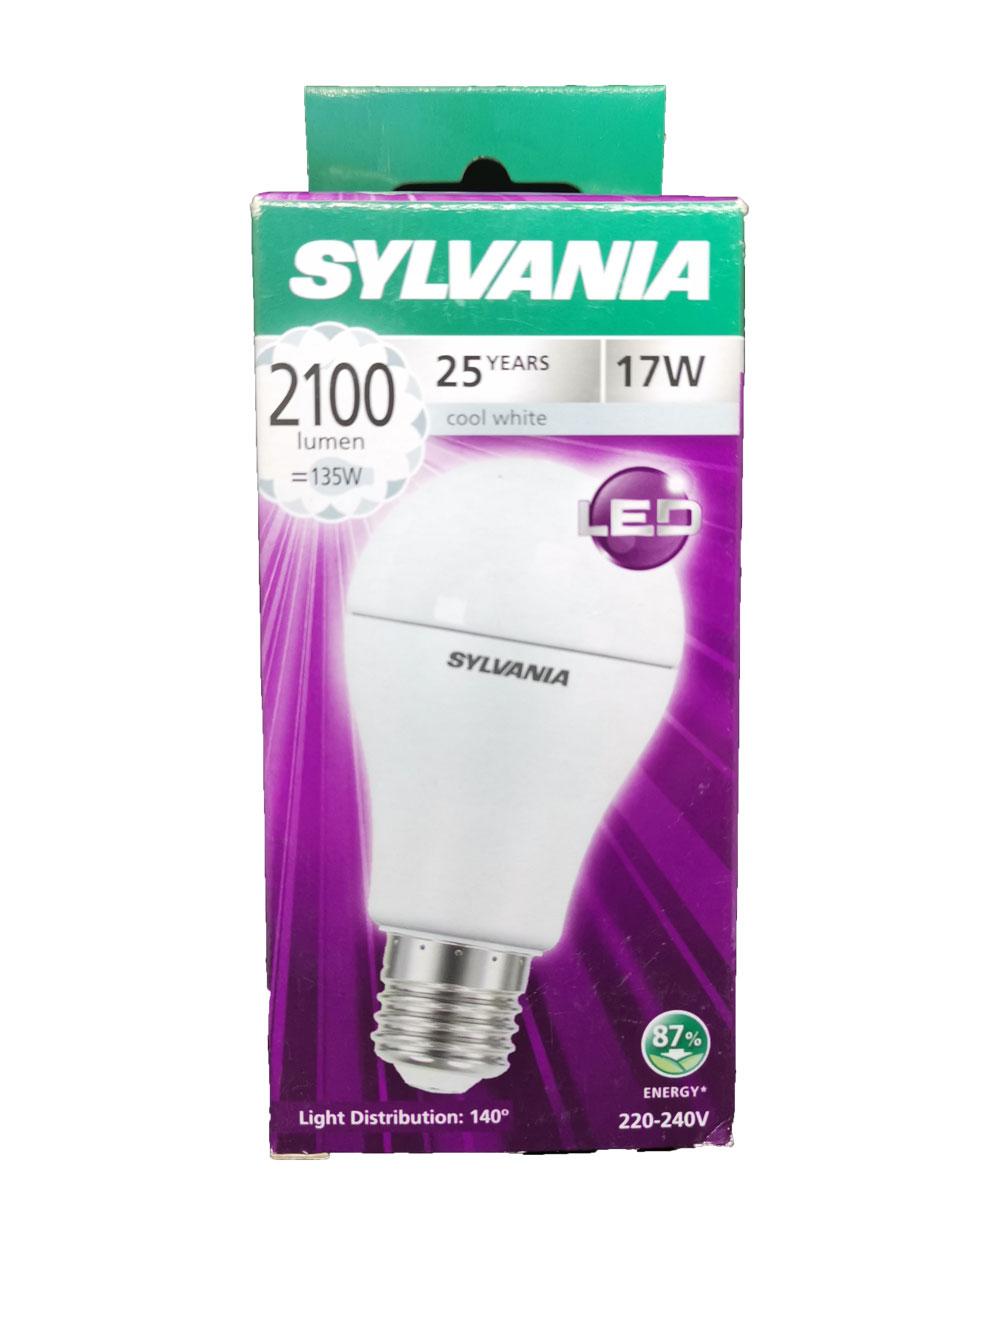 SYLVANIA หลอดไฟ LED ECO ToLEDo A60 17W E27 4000K  (แสงคลูไวท์)